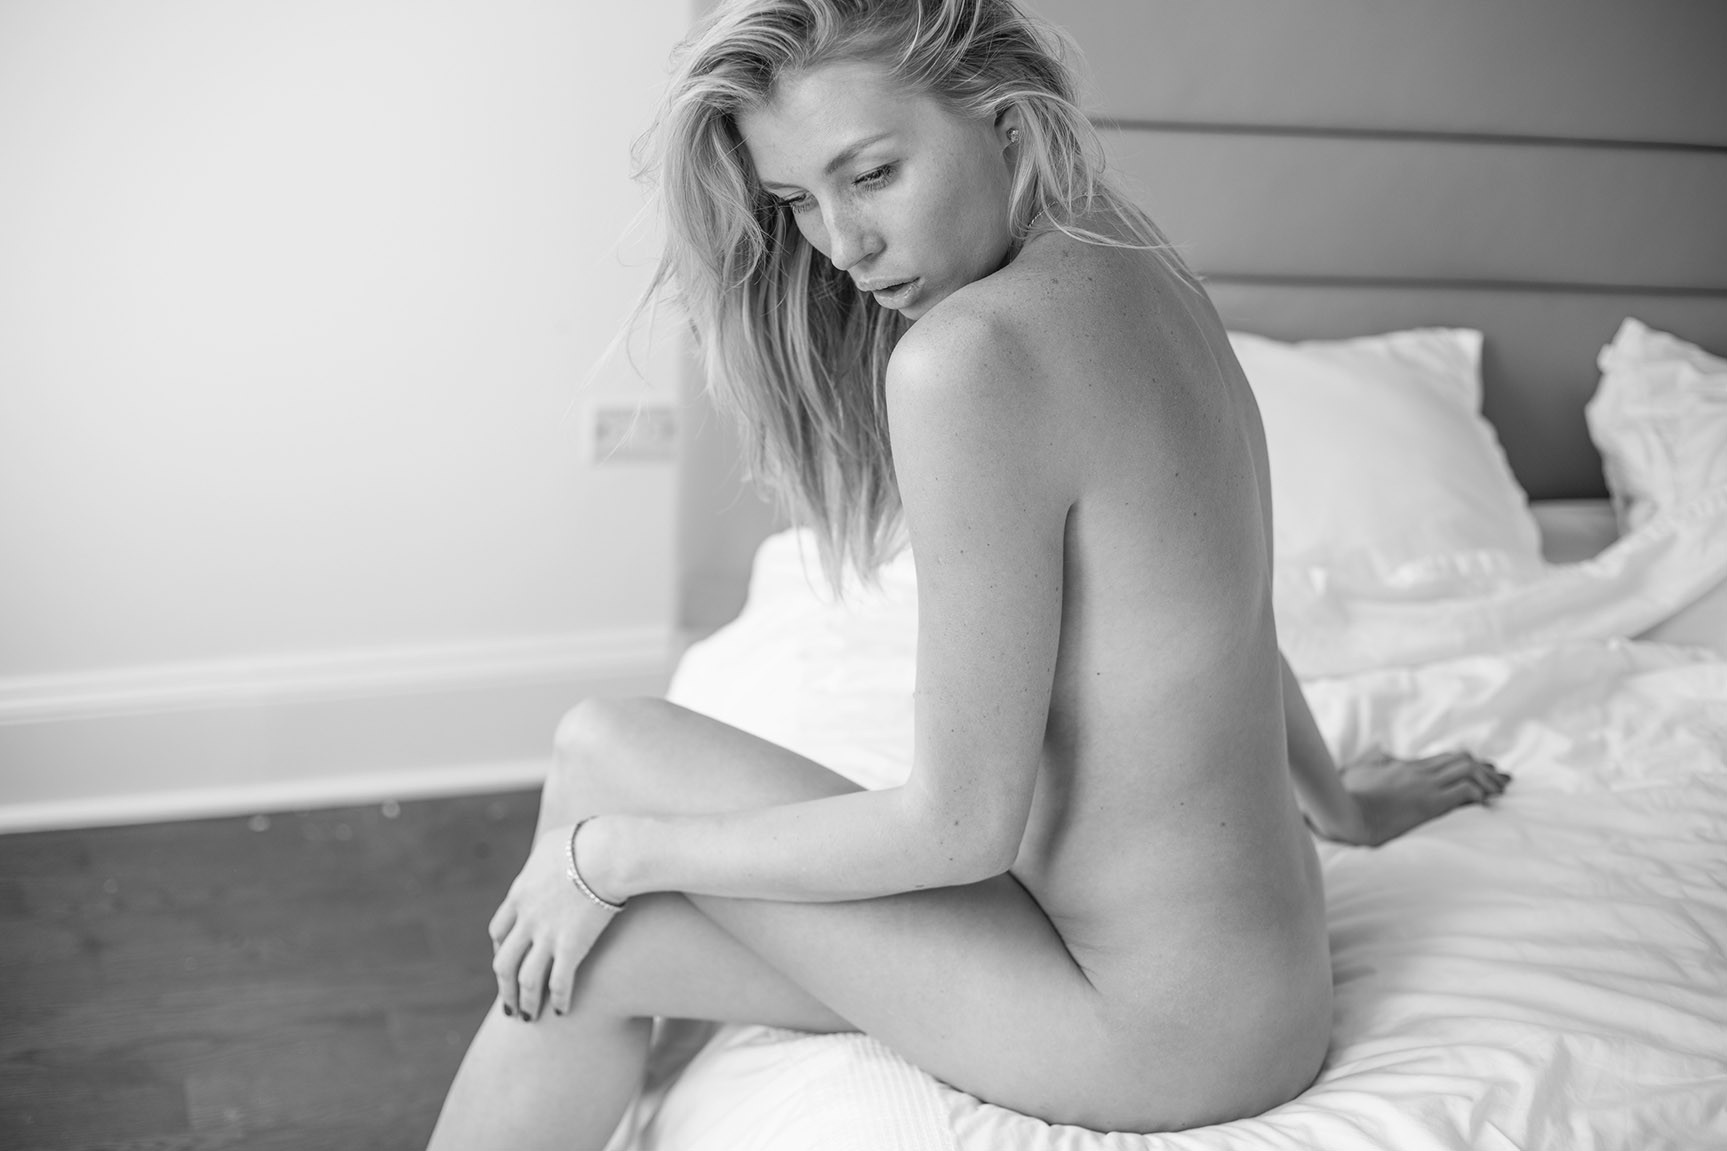 Катя, агент по недвижимости на Манхэттене / фотограф Damon Hall Booth